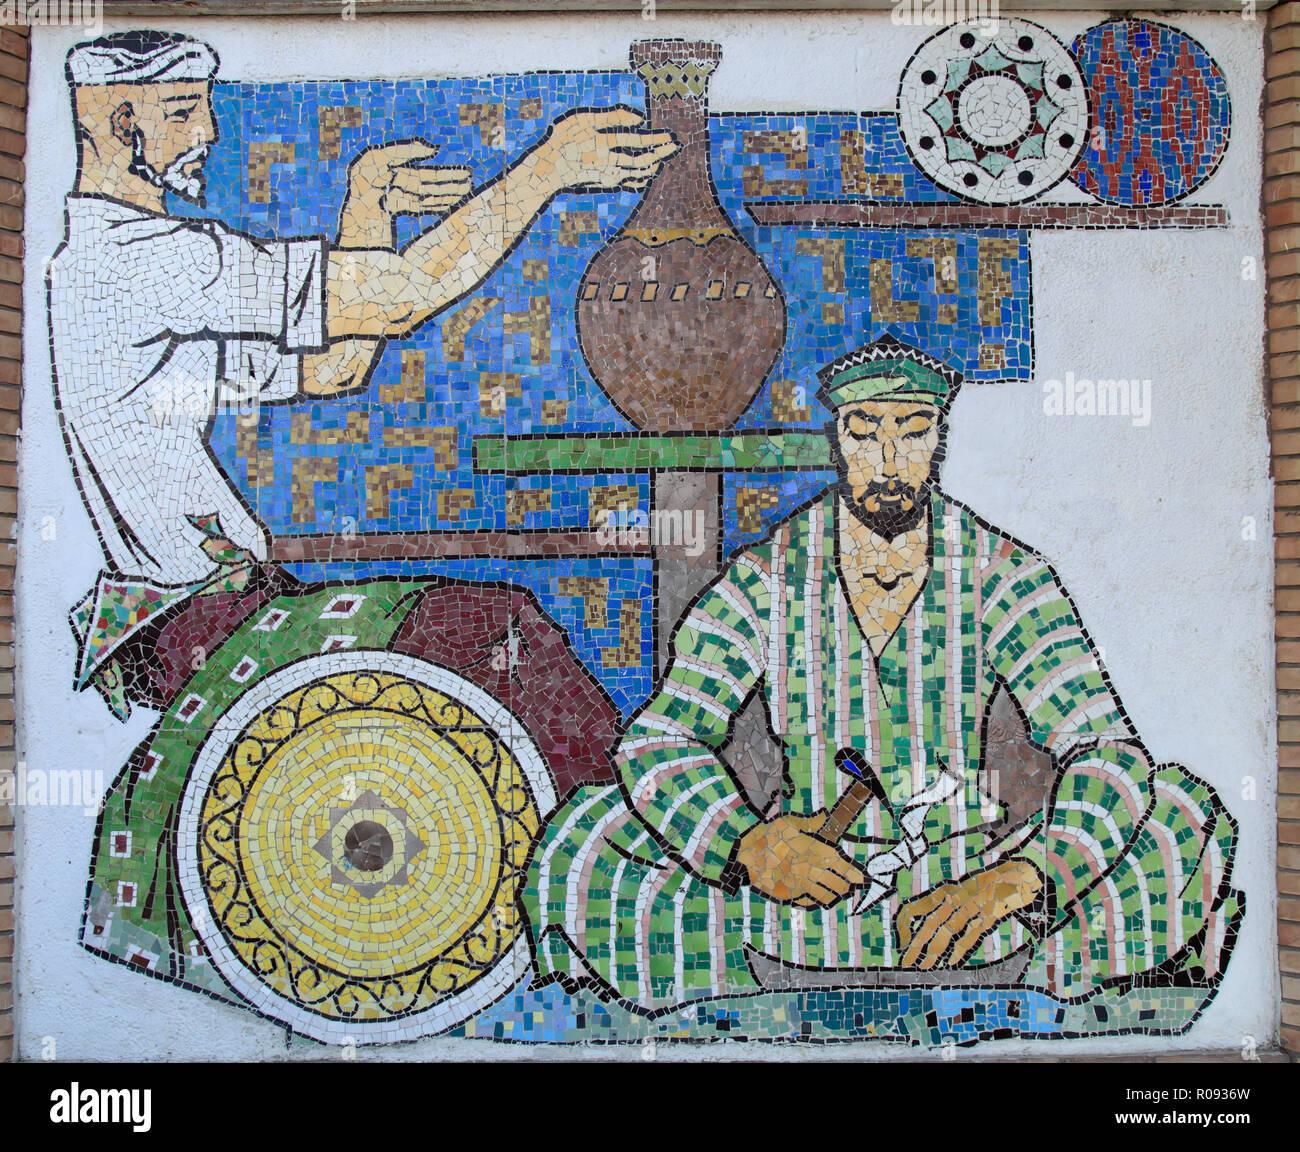 Uzbekistan Tashkent Museum Applied Arts High Resolution Stock Photography And Images Alamy